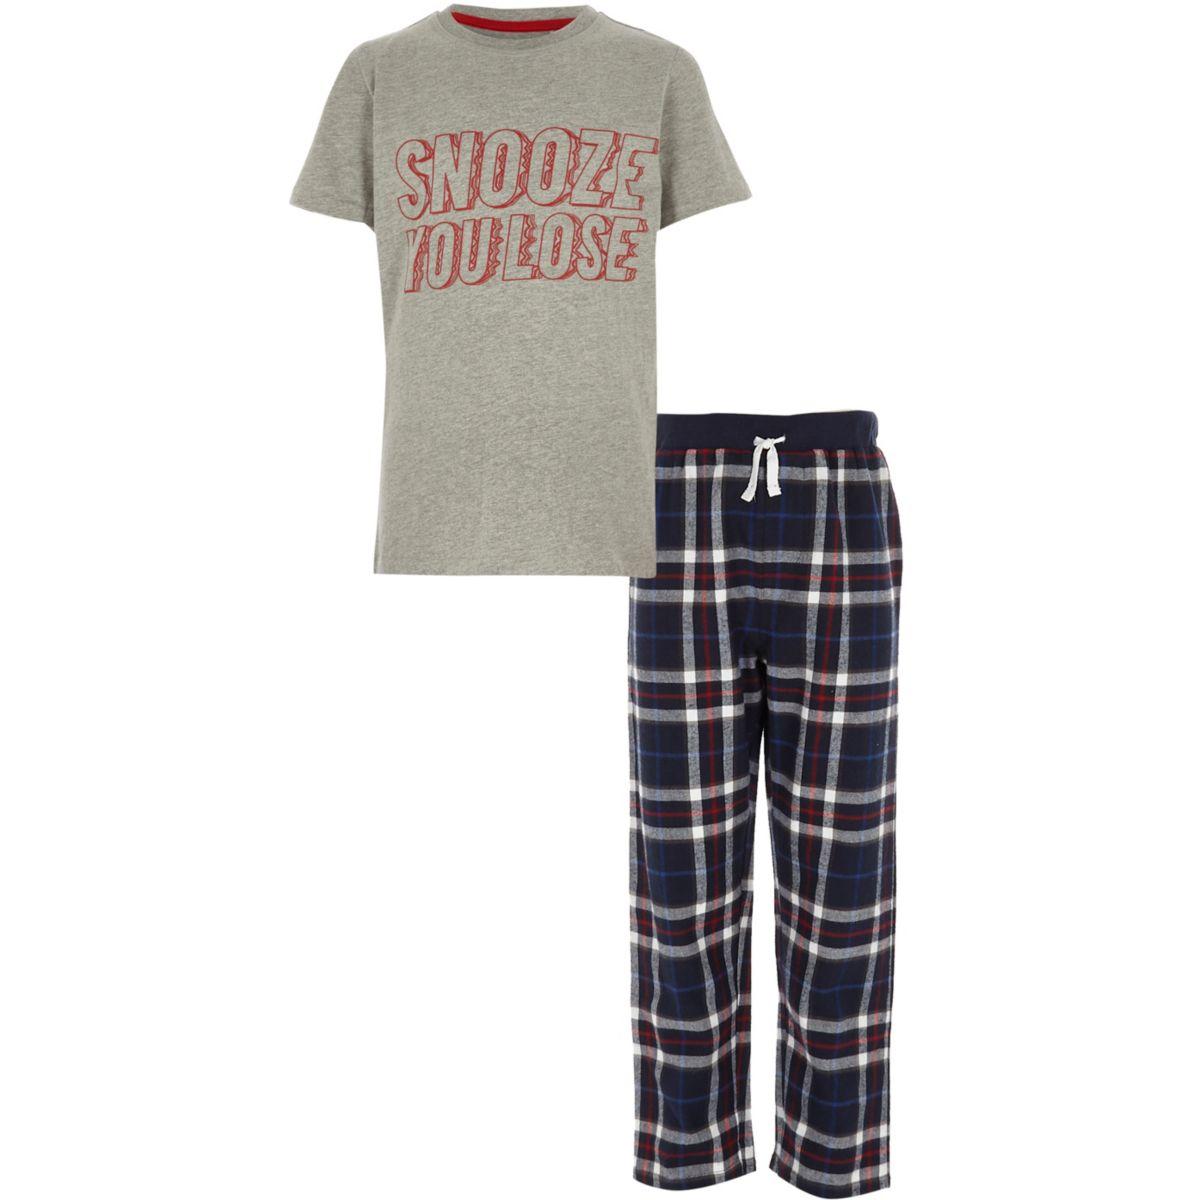 Boys grey 'snooze you lose' pajama set